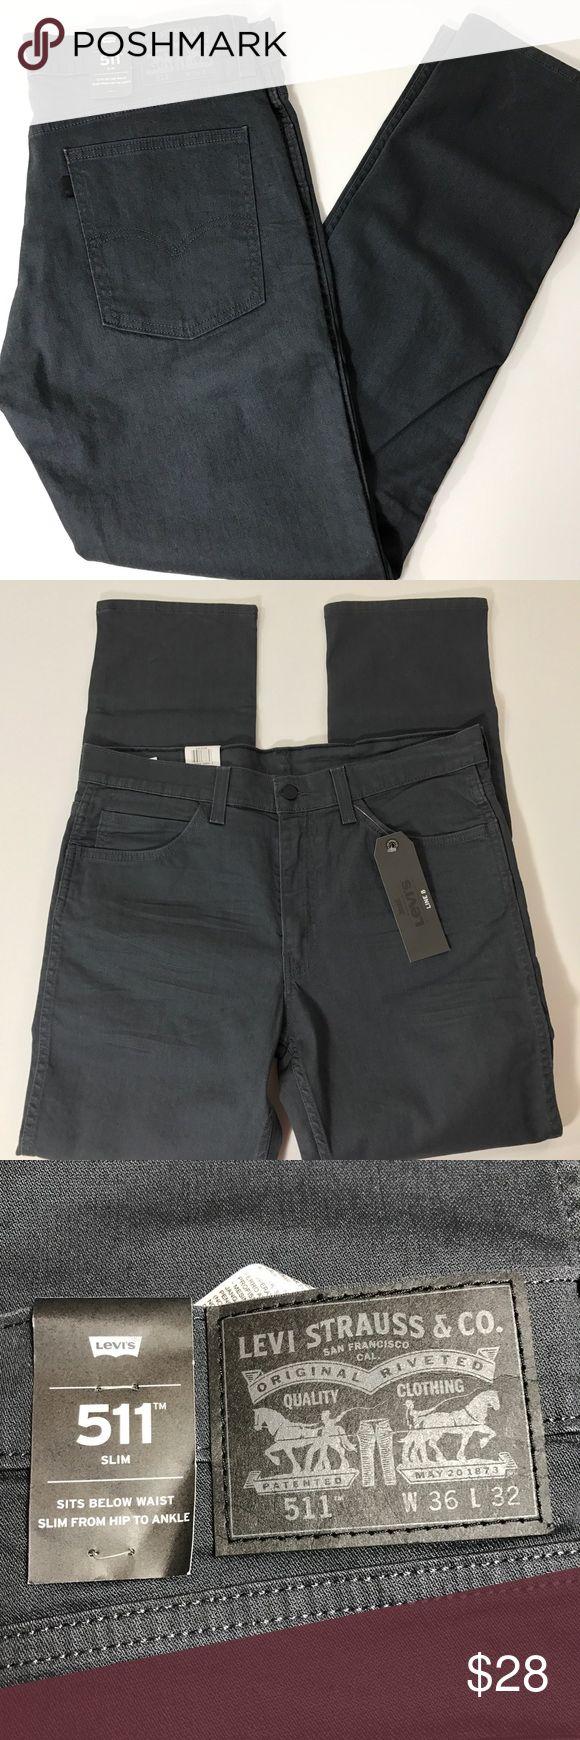 NWT MEN LEVIS 511 SLIM JEAN DARK GRAY LINE 8 36x32 Nice dark gray color  Waist 36 inches  Inseam 32 inches Levi's Jeans Slim Straight